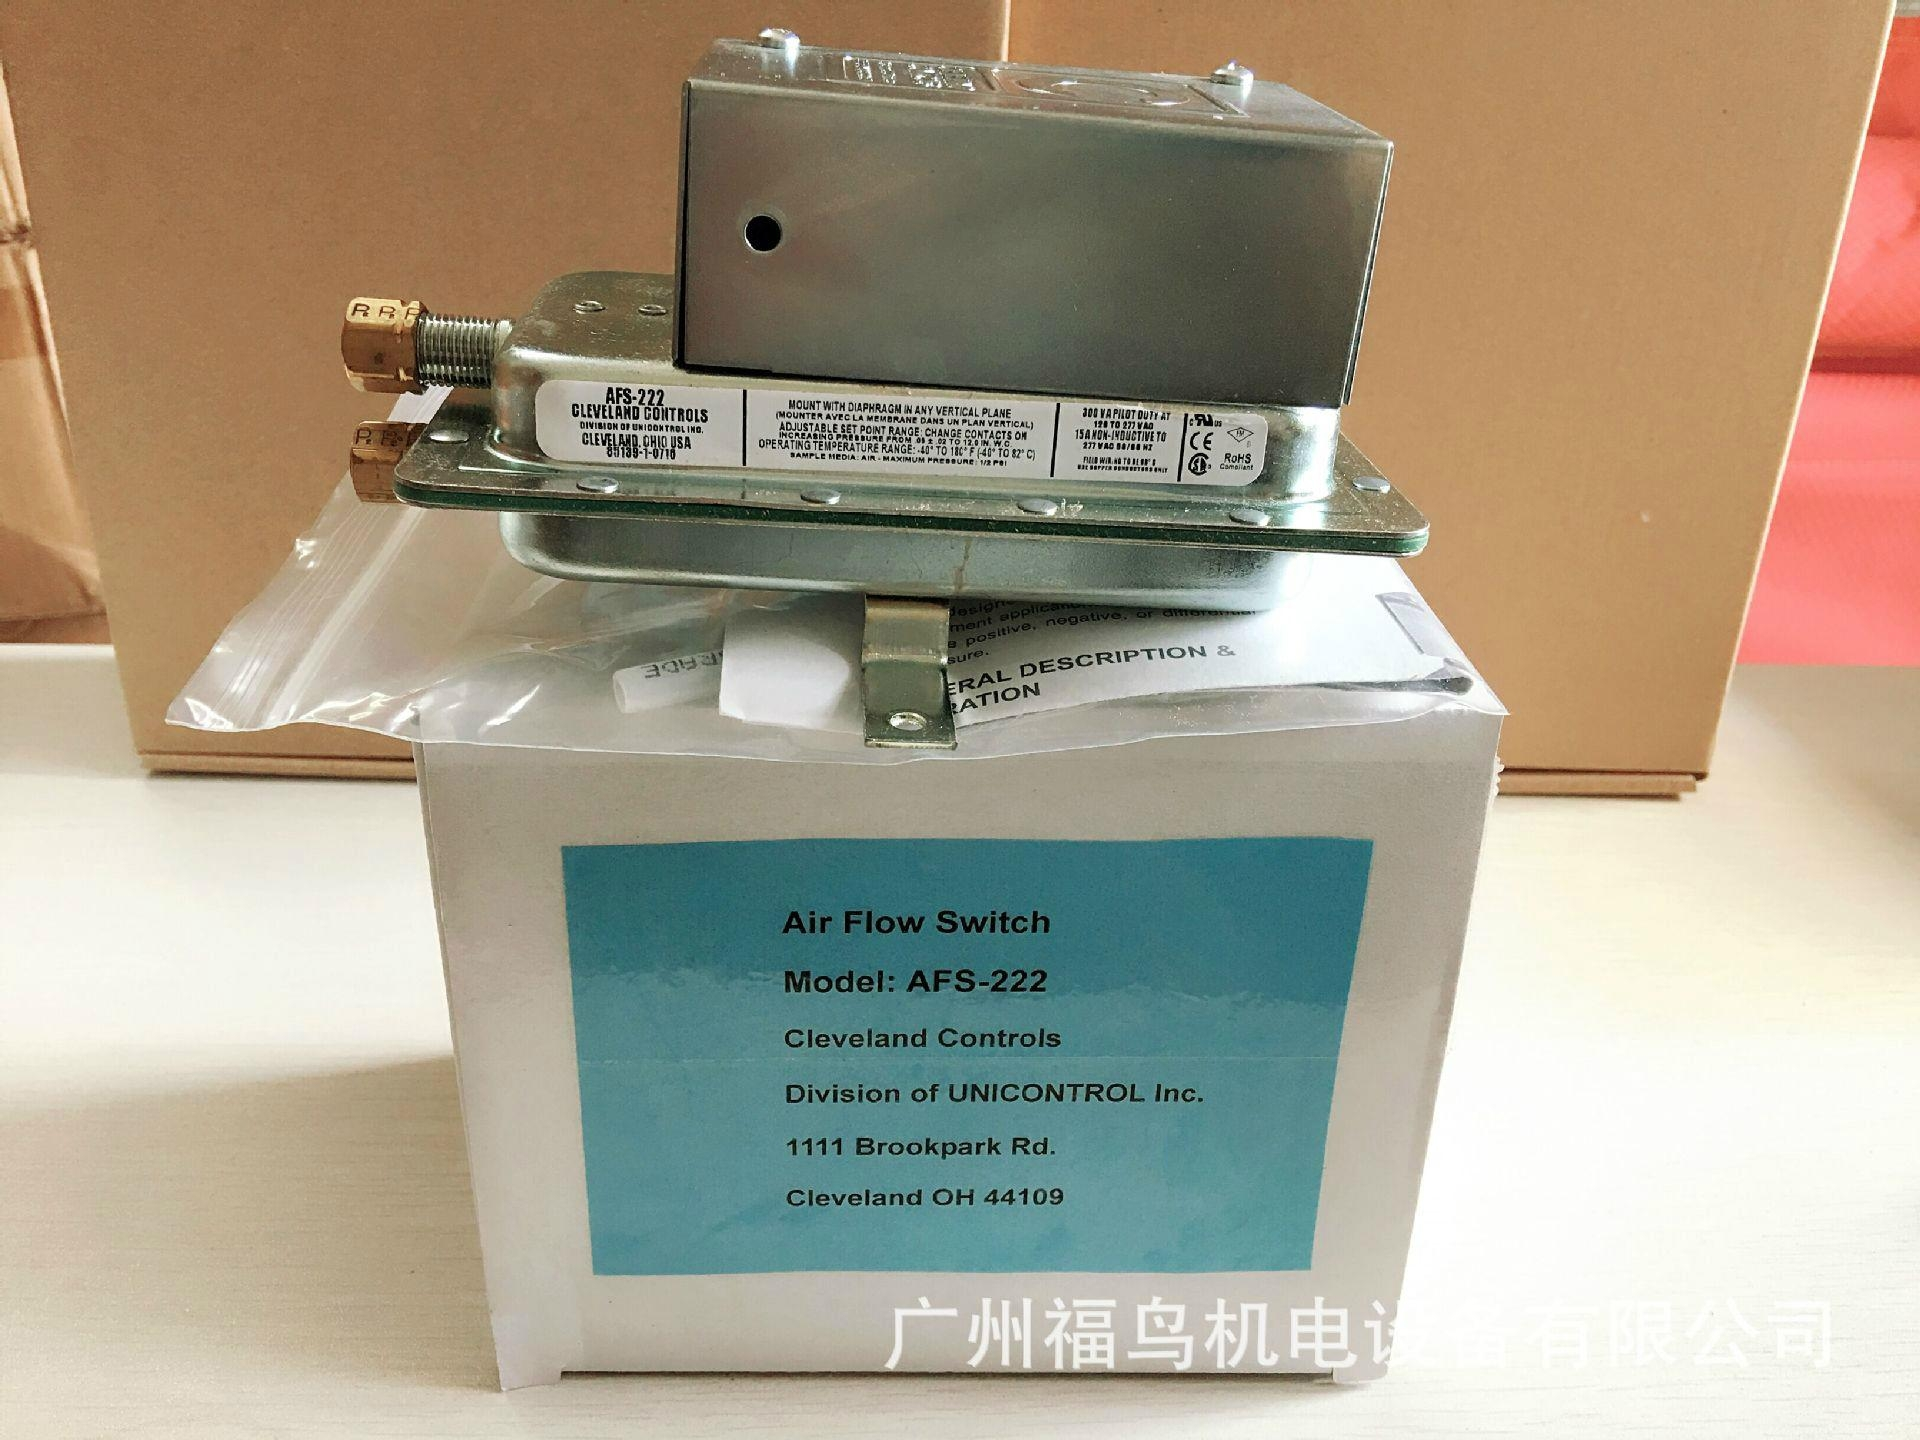 CLEVELAND CONTROLS壓力開關, 型號: AFS-222